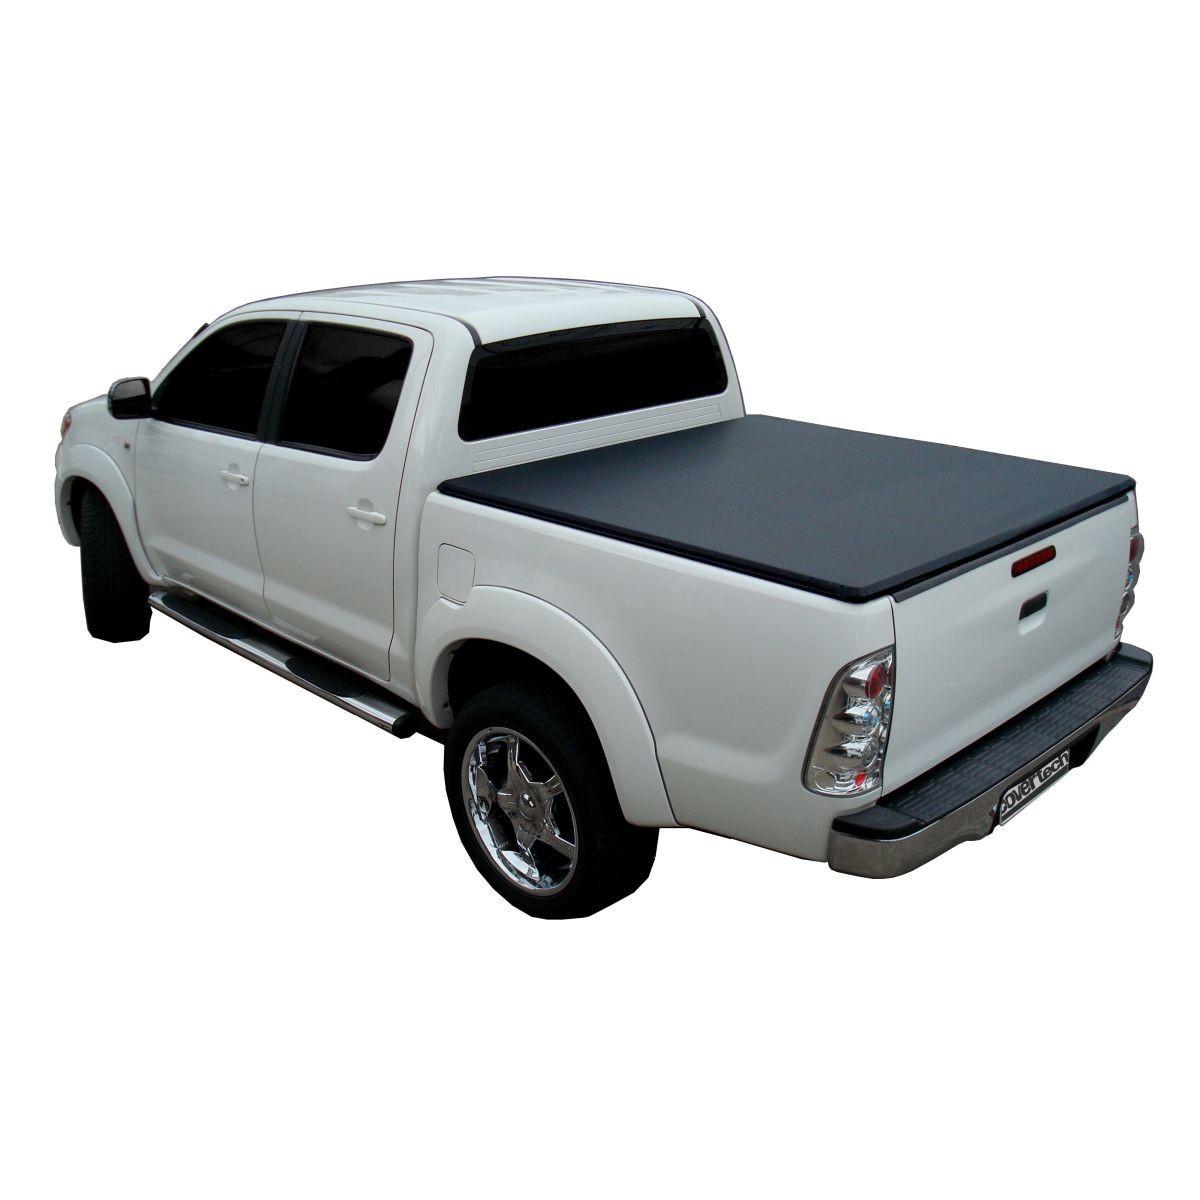 Carpa Plana Para Pick Up Y Camionetas Toyota Hilux